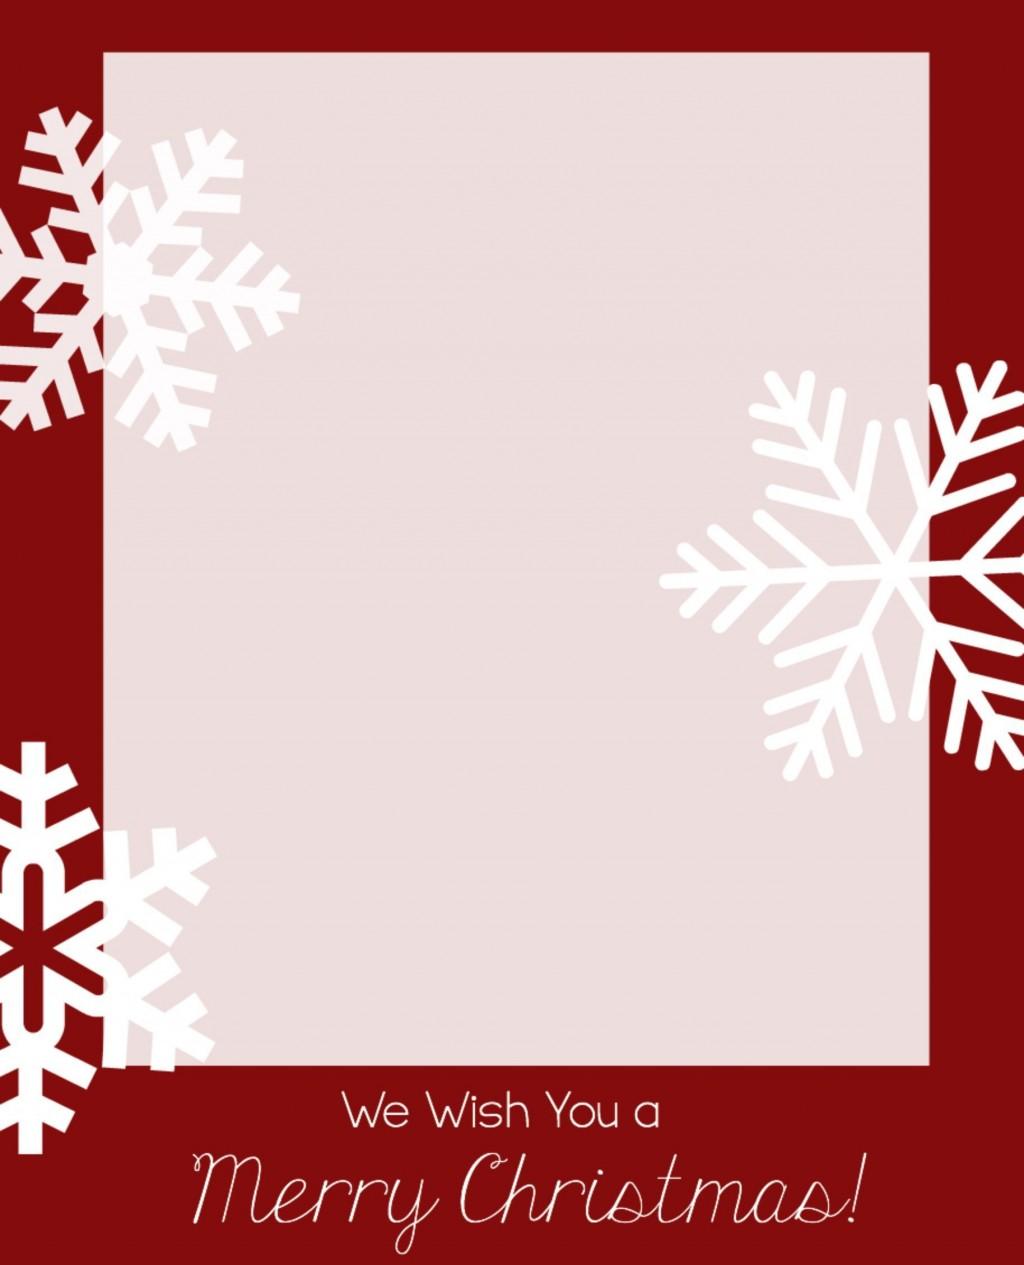 000 Fantastic Free Printable Holiday Card Template Idea  Templates Christma Tent Recipe Gift HolderLarge